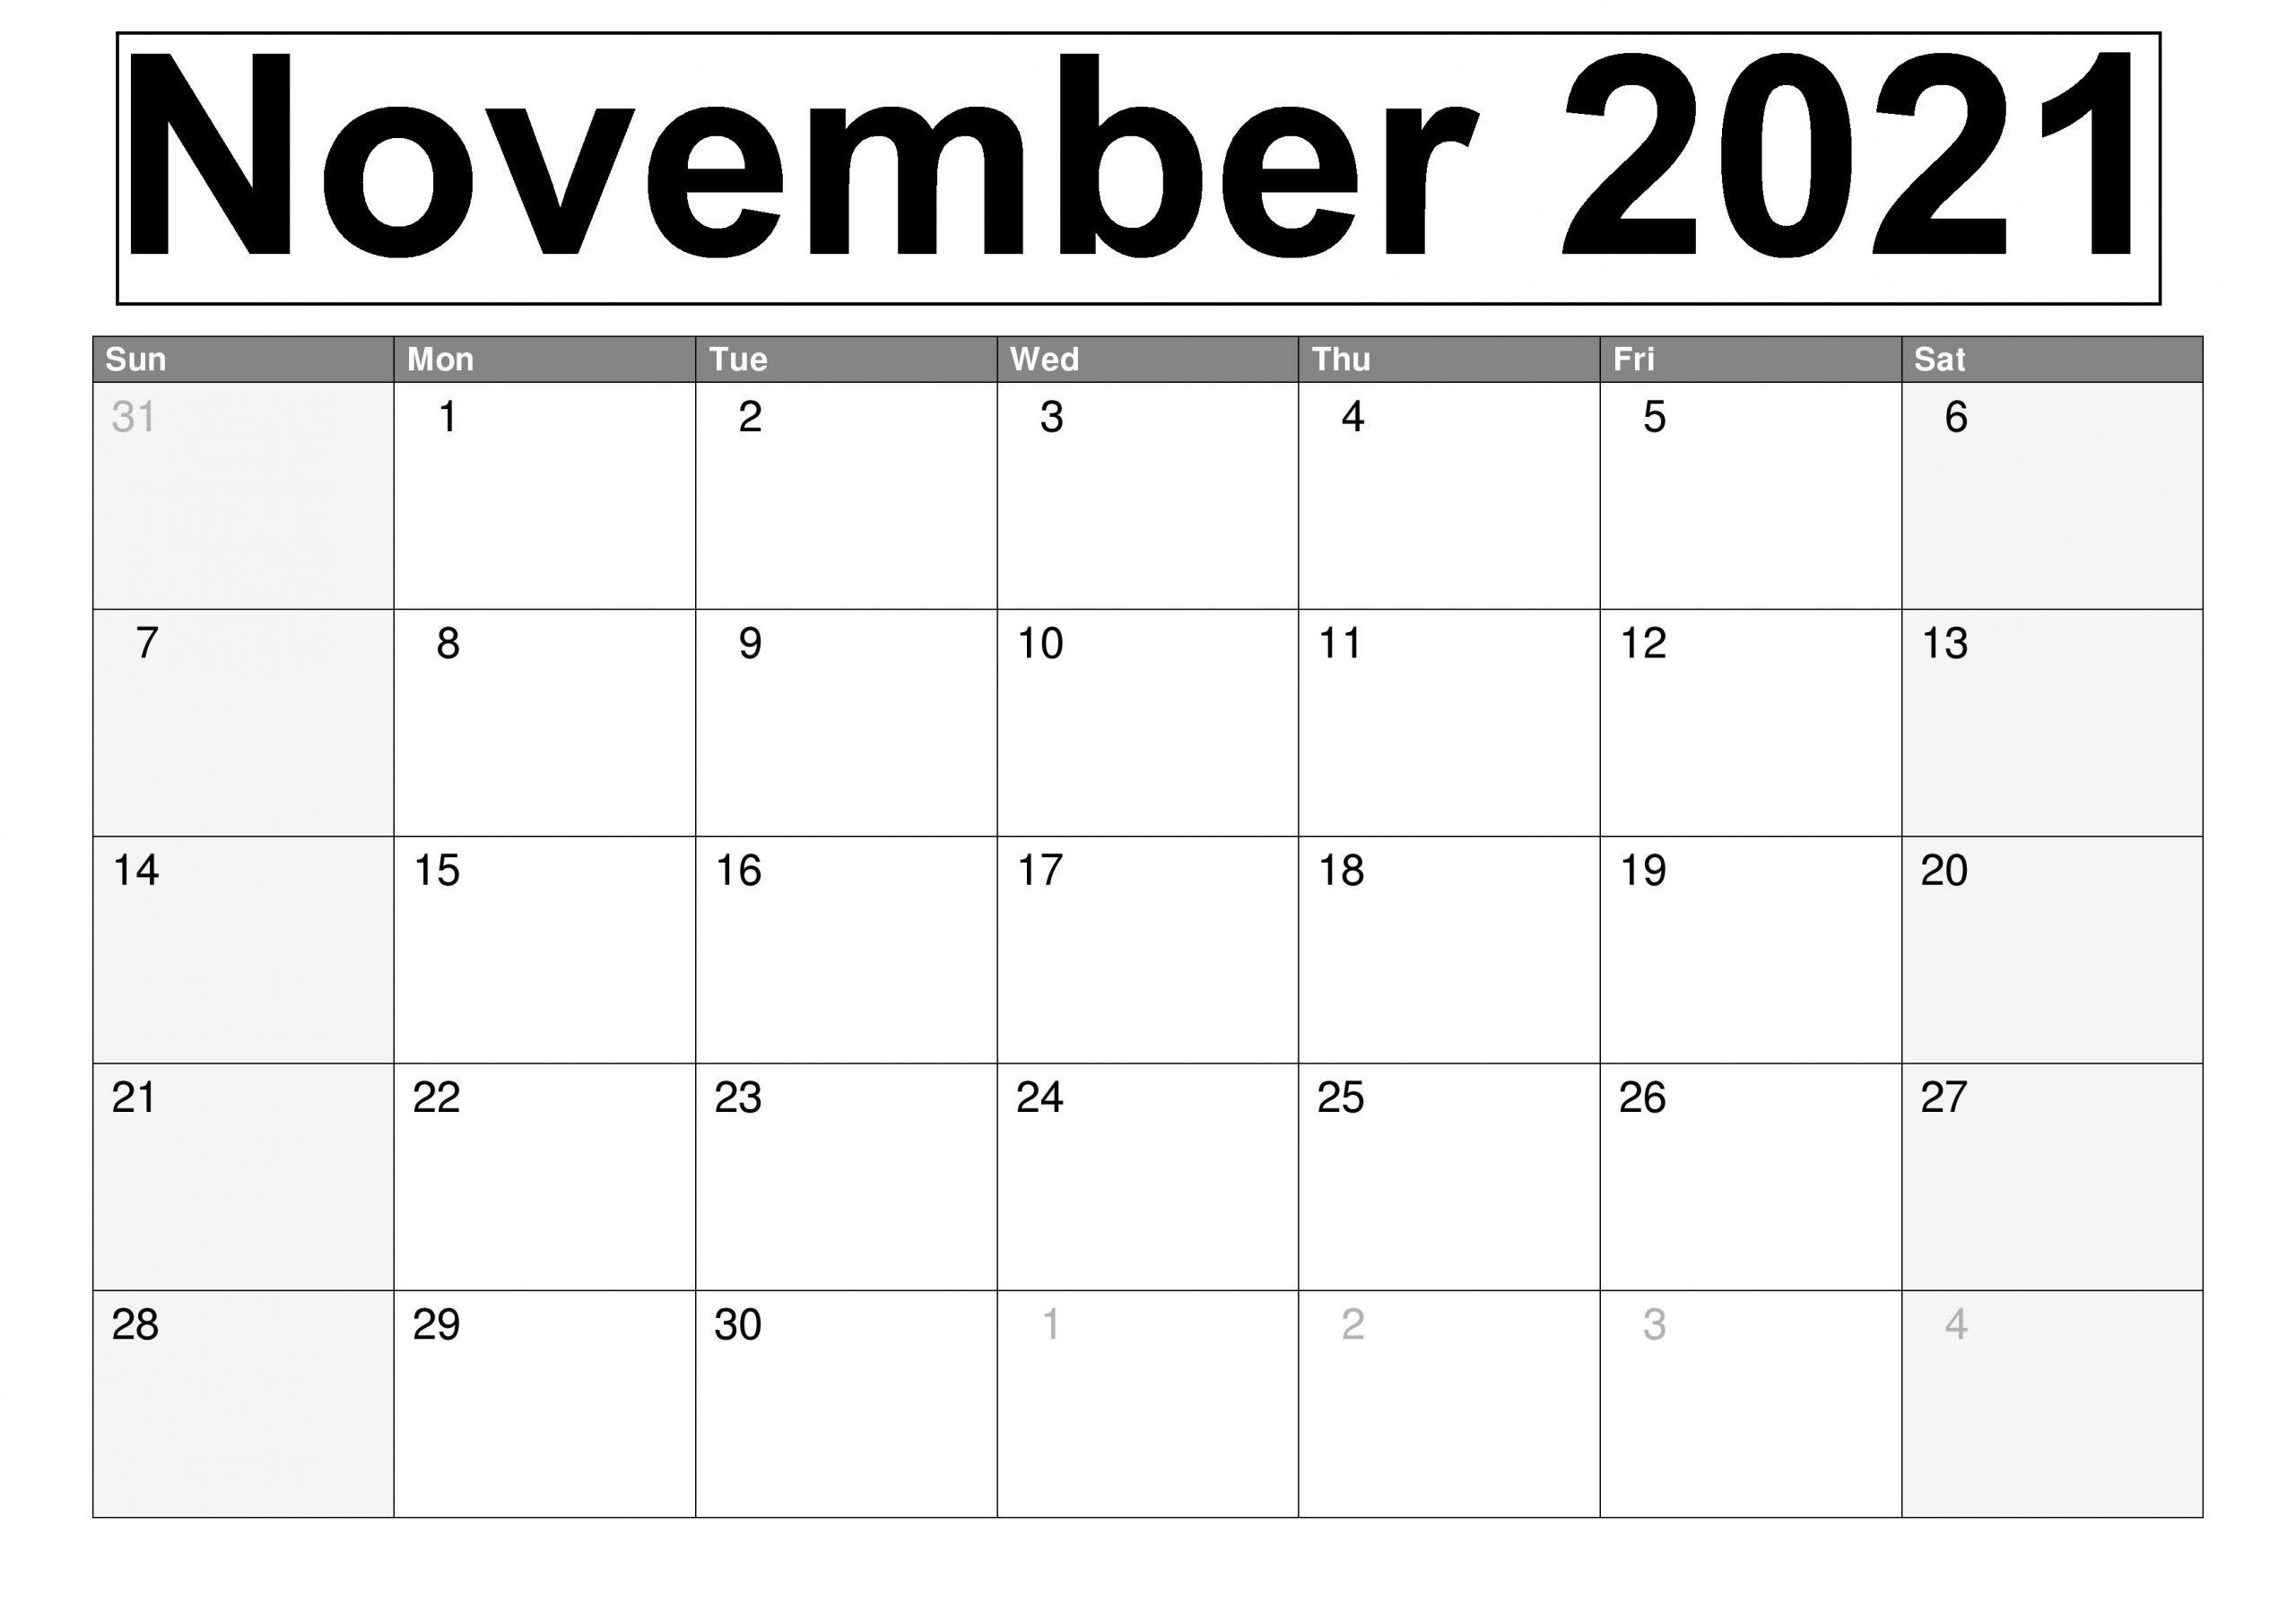 November 2021 Calendar Kalnirnay